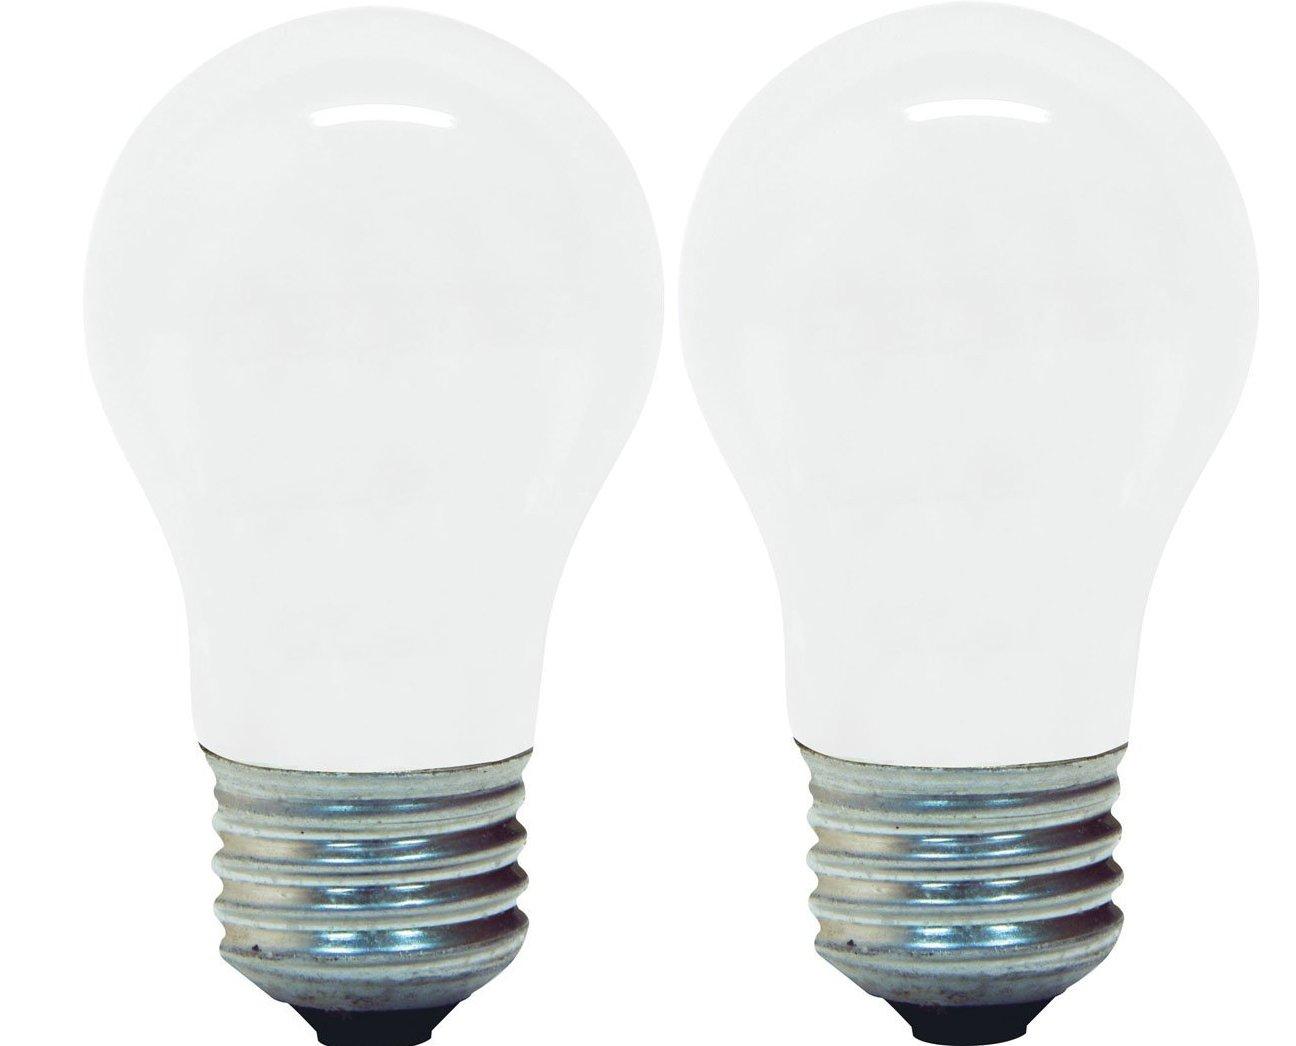 GE Lighting 12658 15-Watt 100-Lumen General Purpose A15 Incandescent Light Bulb